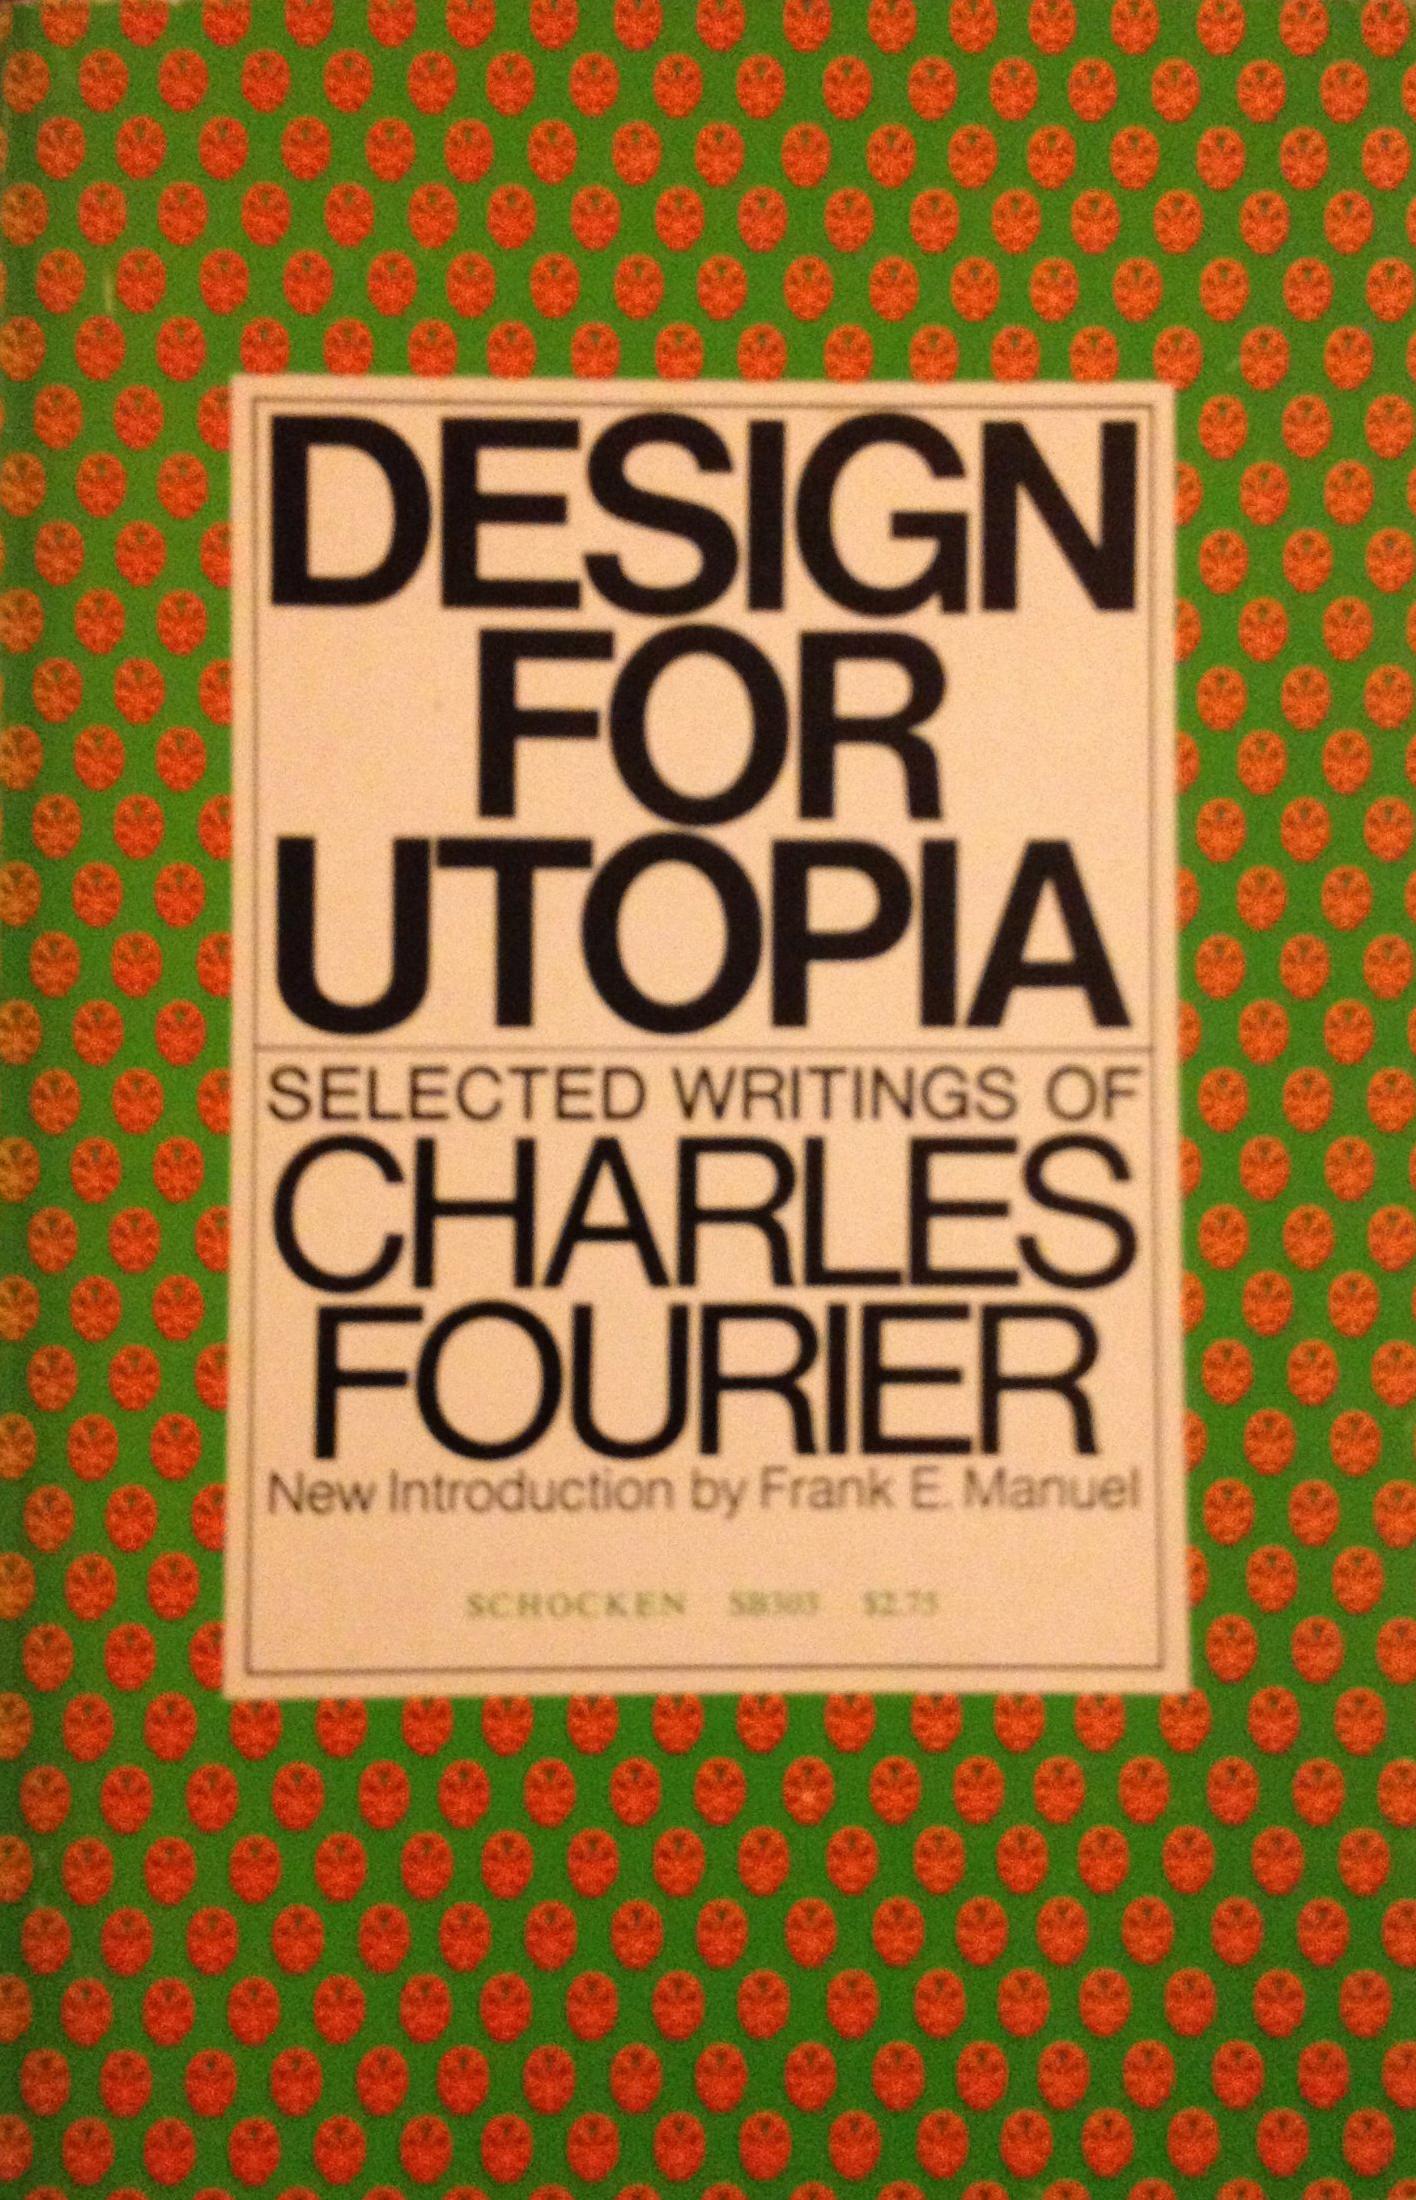 DESIGN FOR UTOPIA